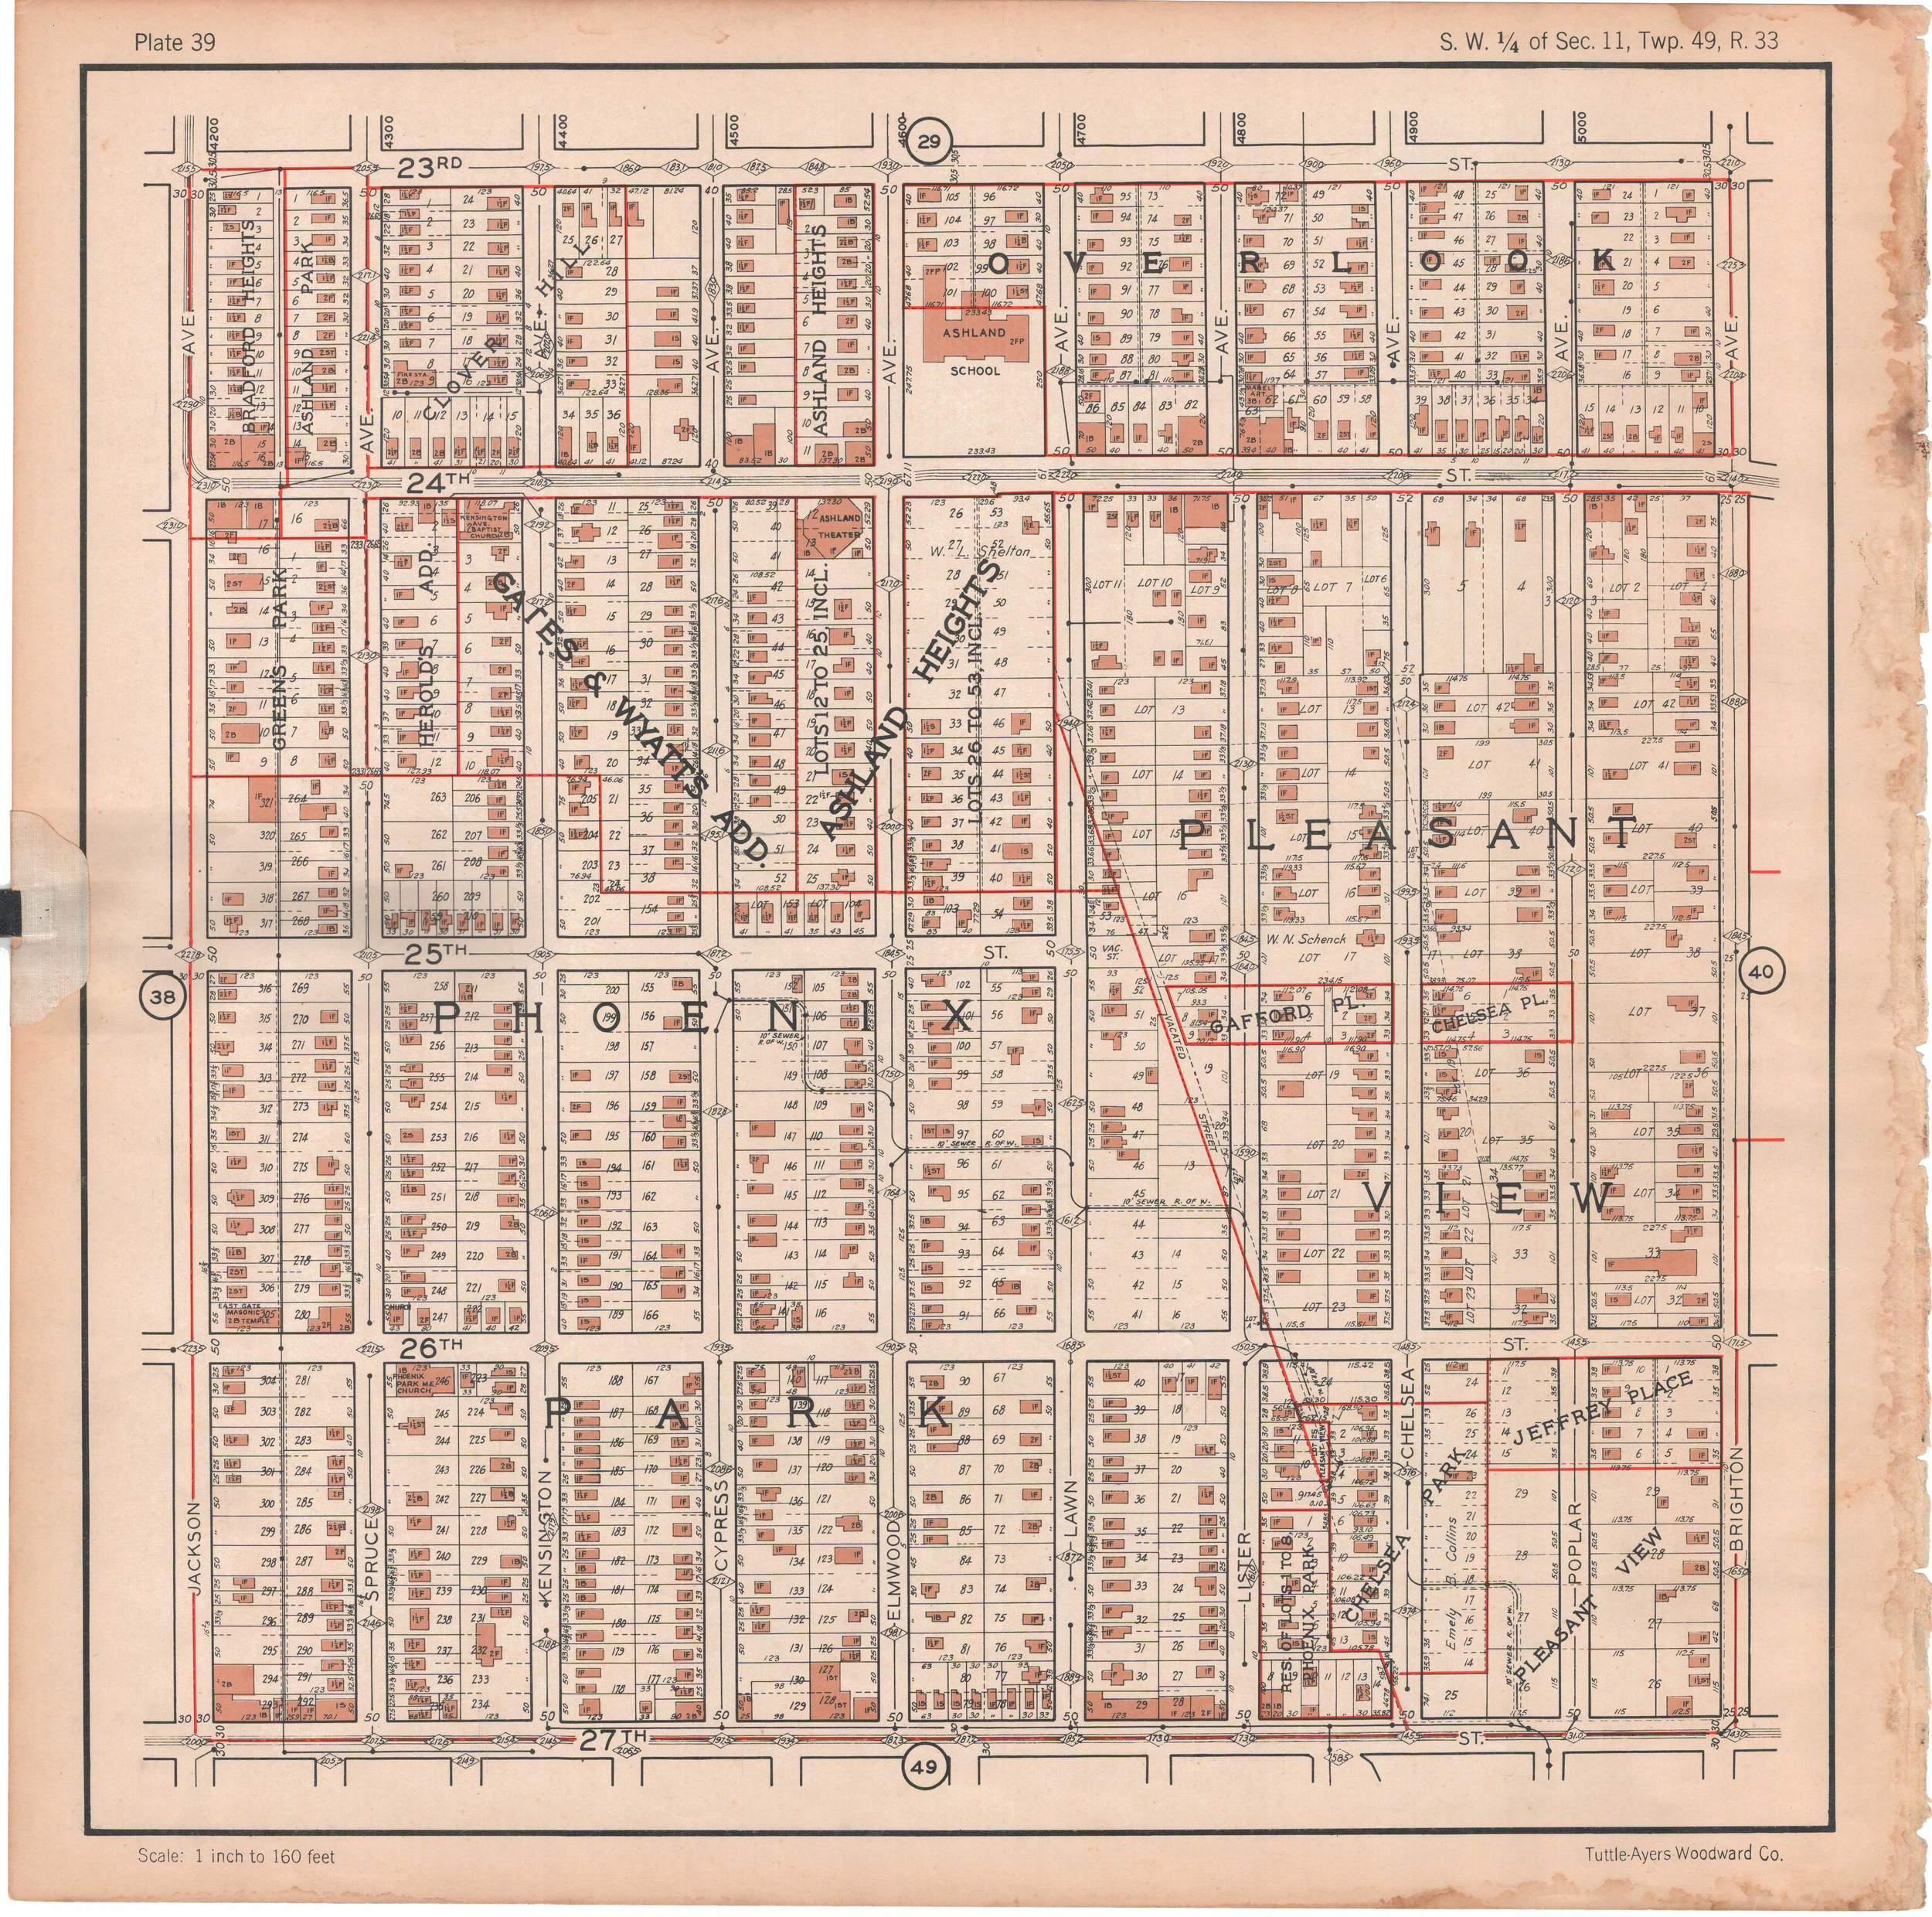 1925 TUTTLE_AYERS_Plate 39.JPG